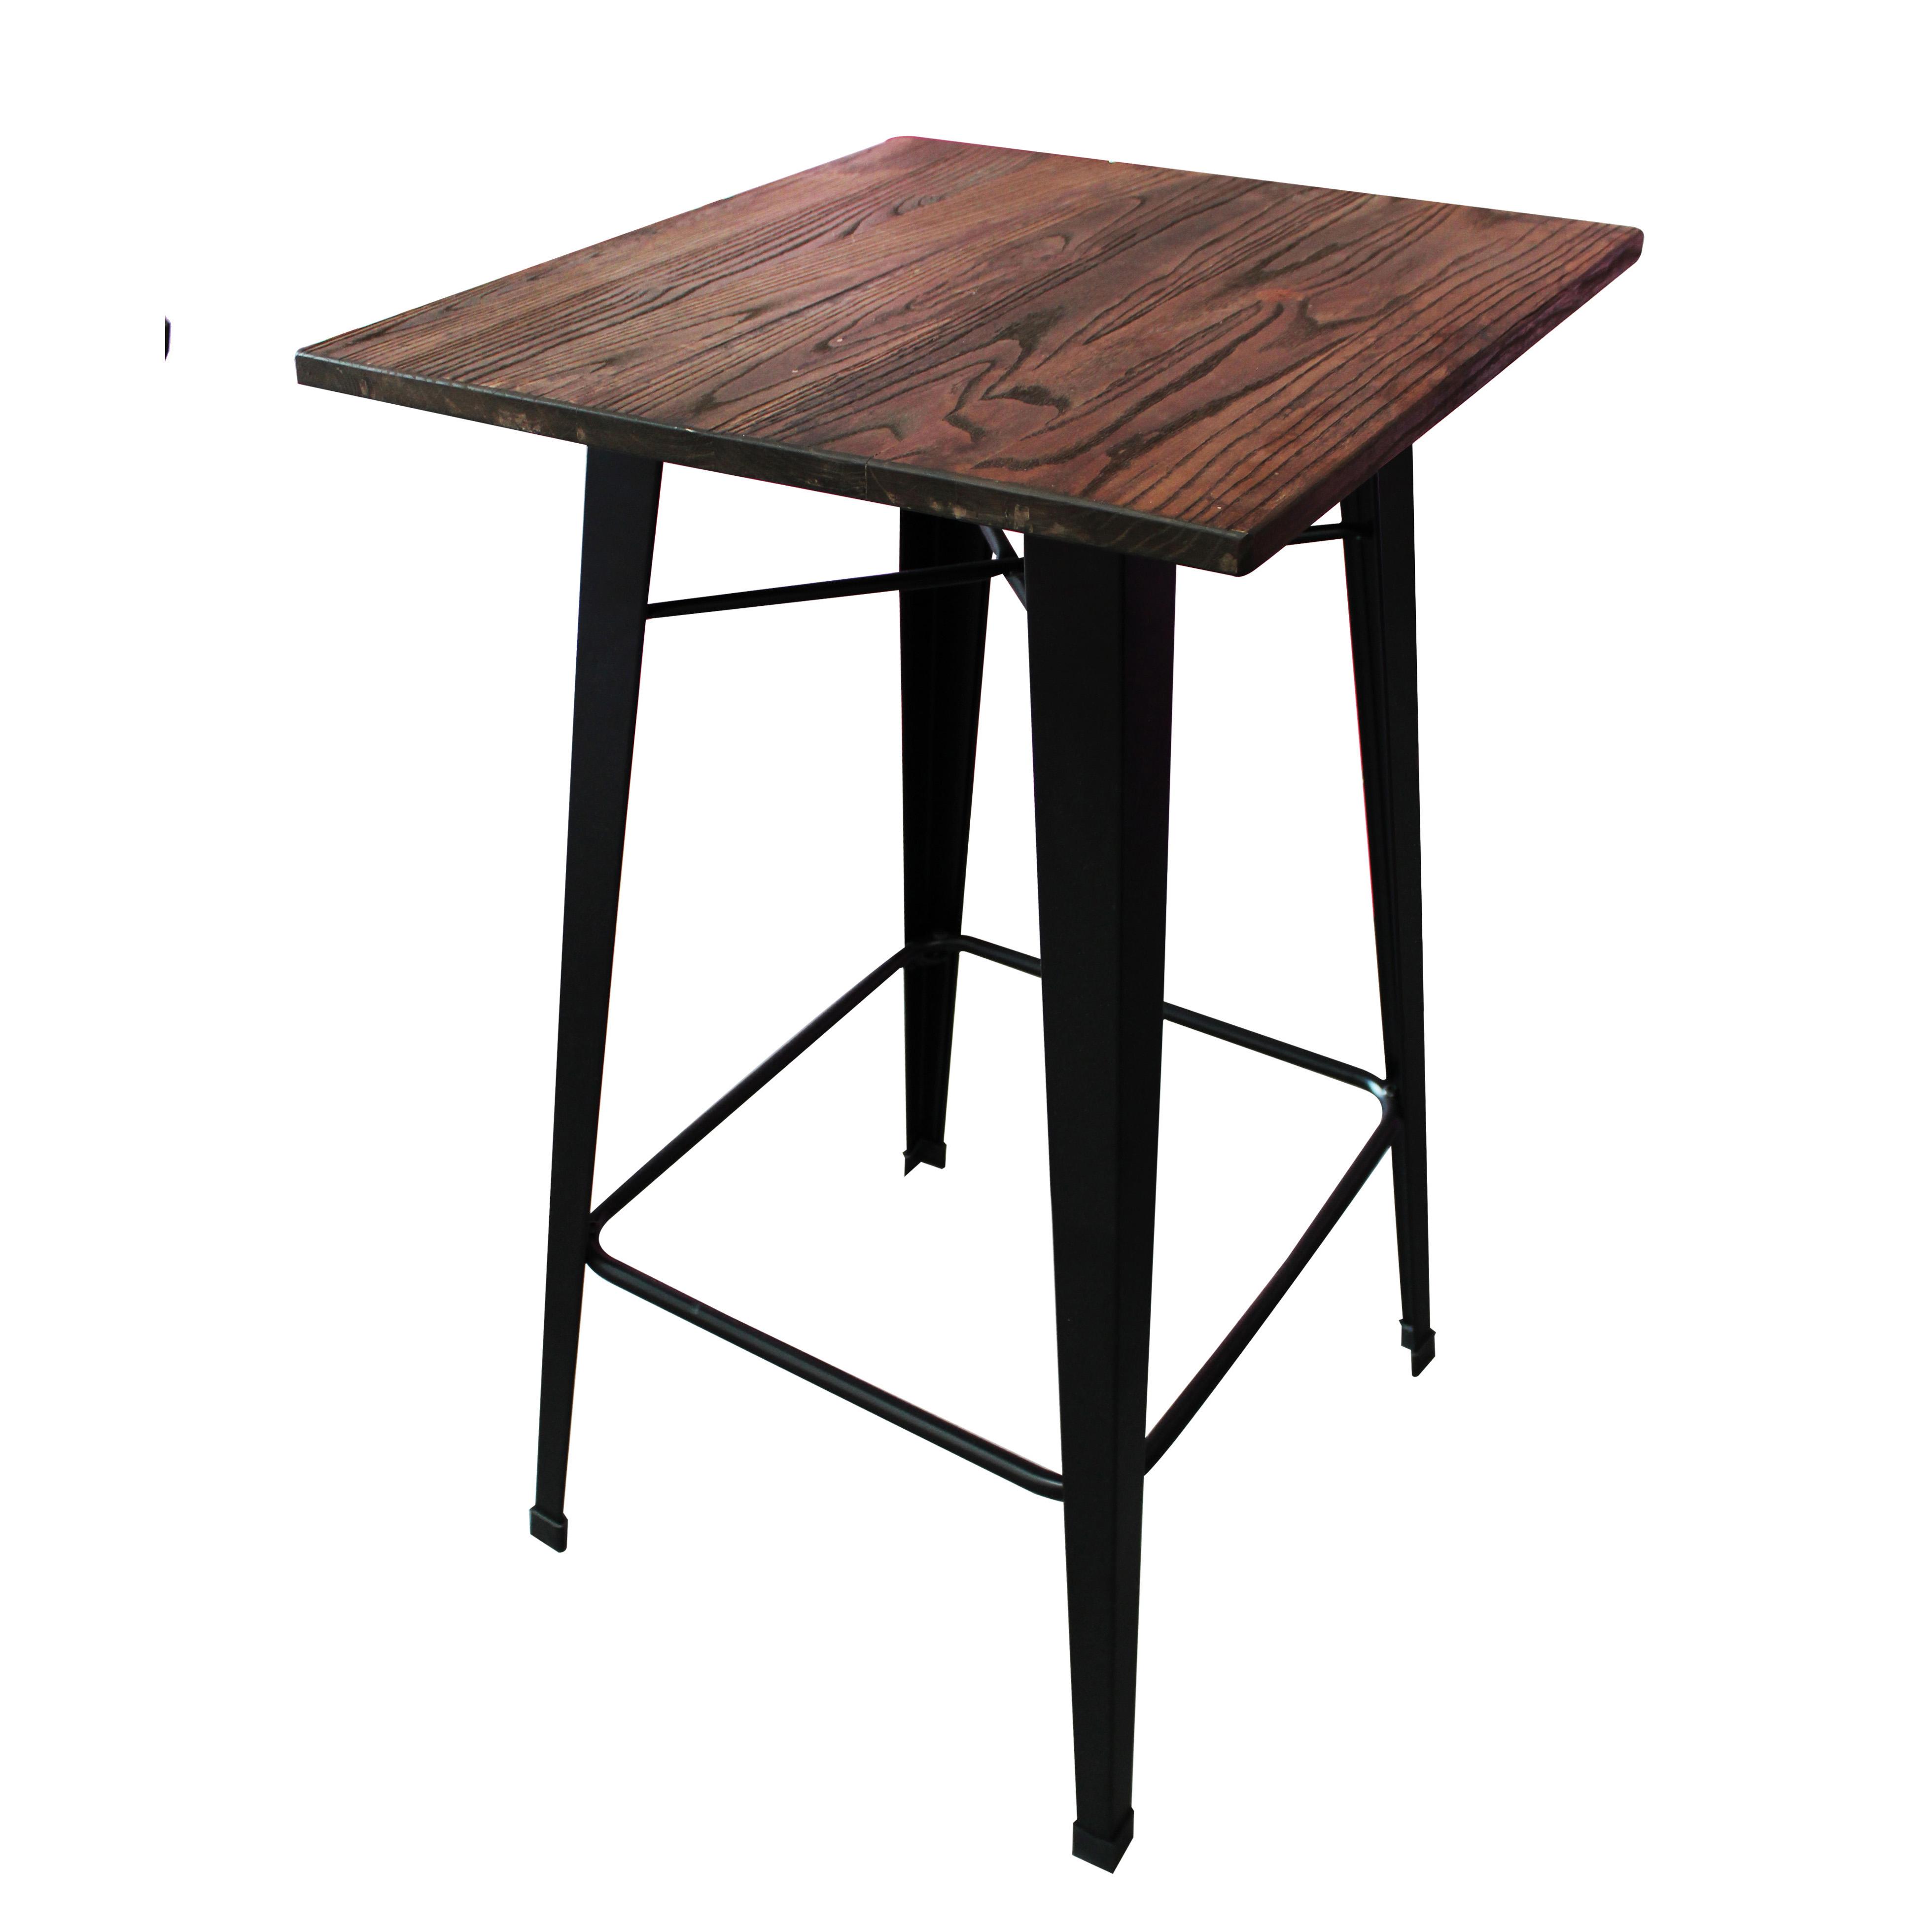 Mesa cafeteria alta folix grupo meta soluciones de for Mesas de madera bar